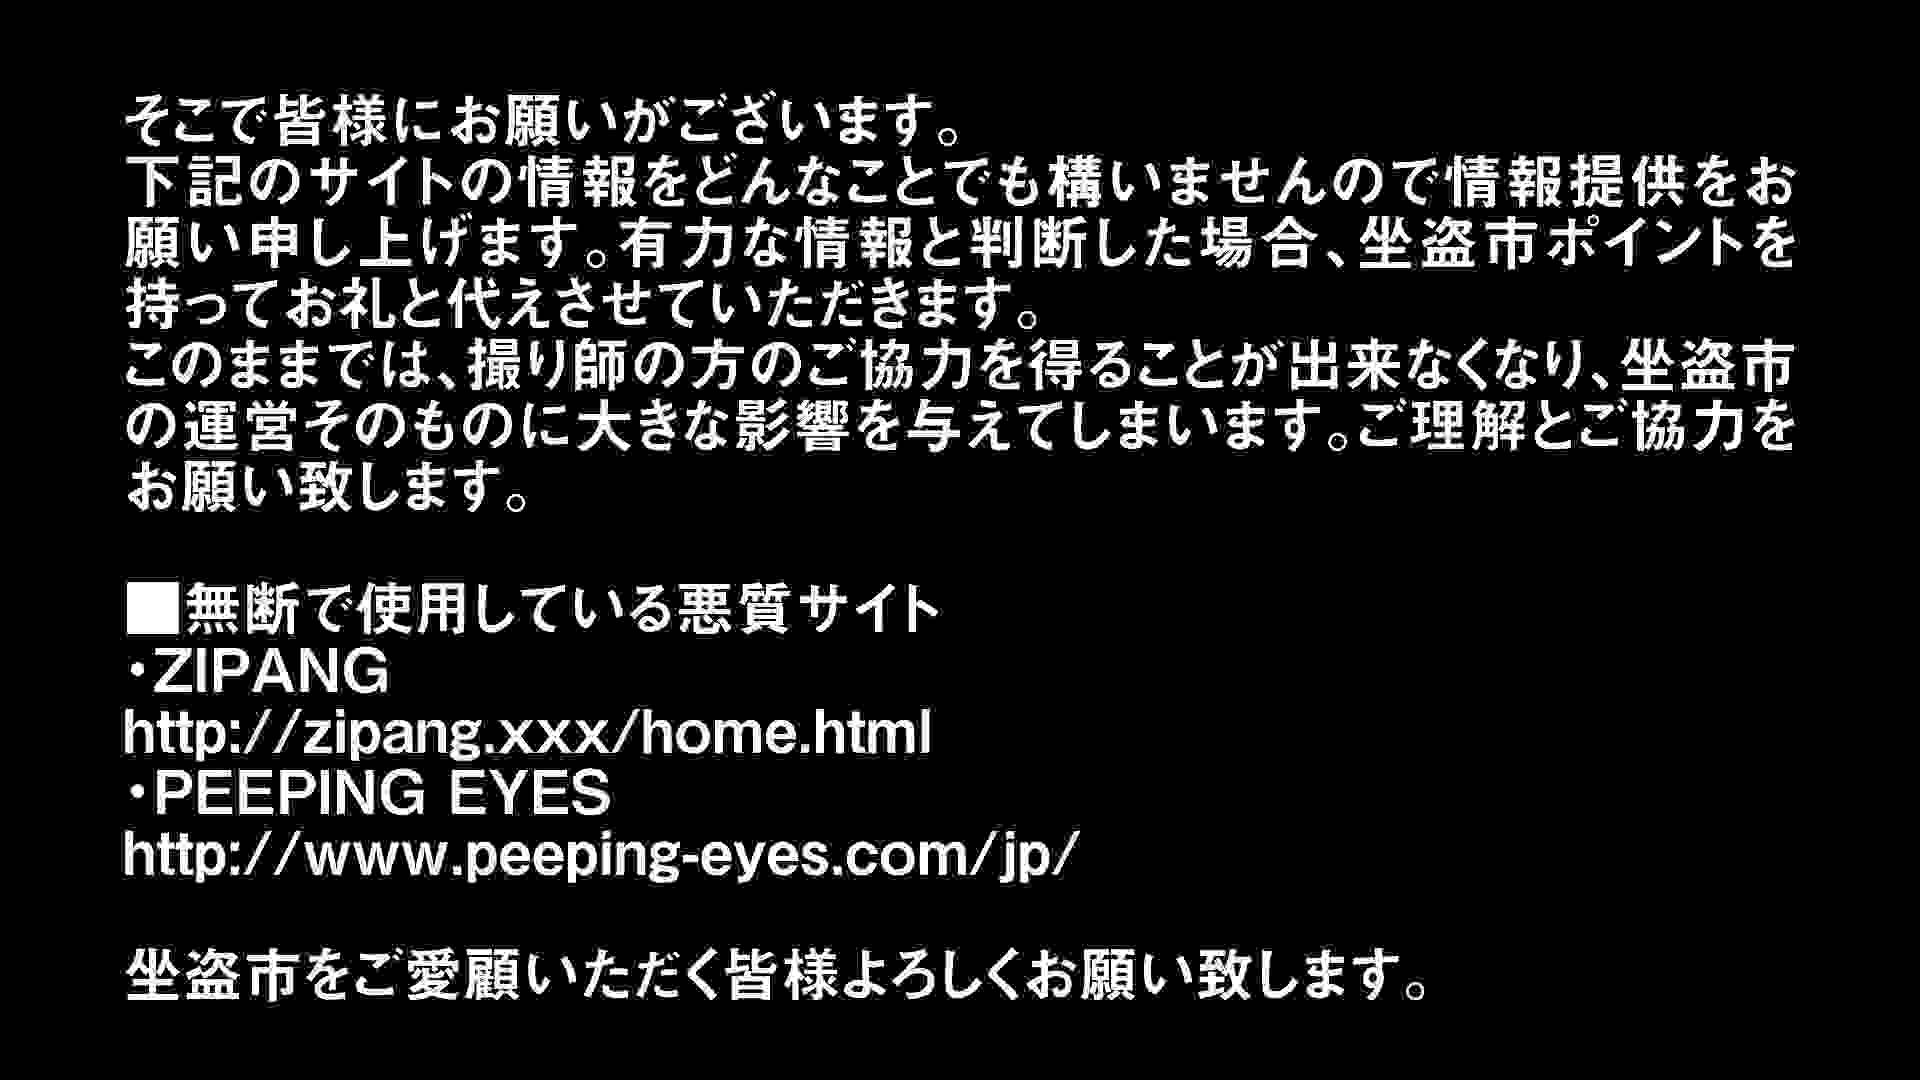 Aquaな露天風呂Vol.294 OLセックス  75画像 24